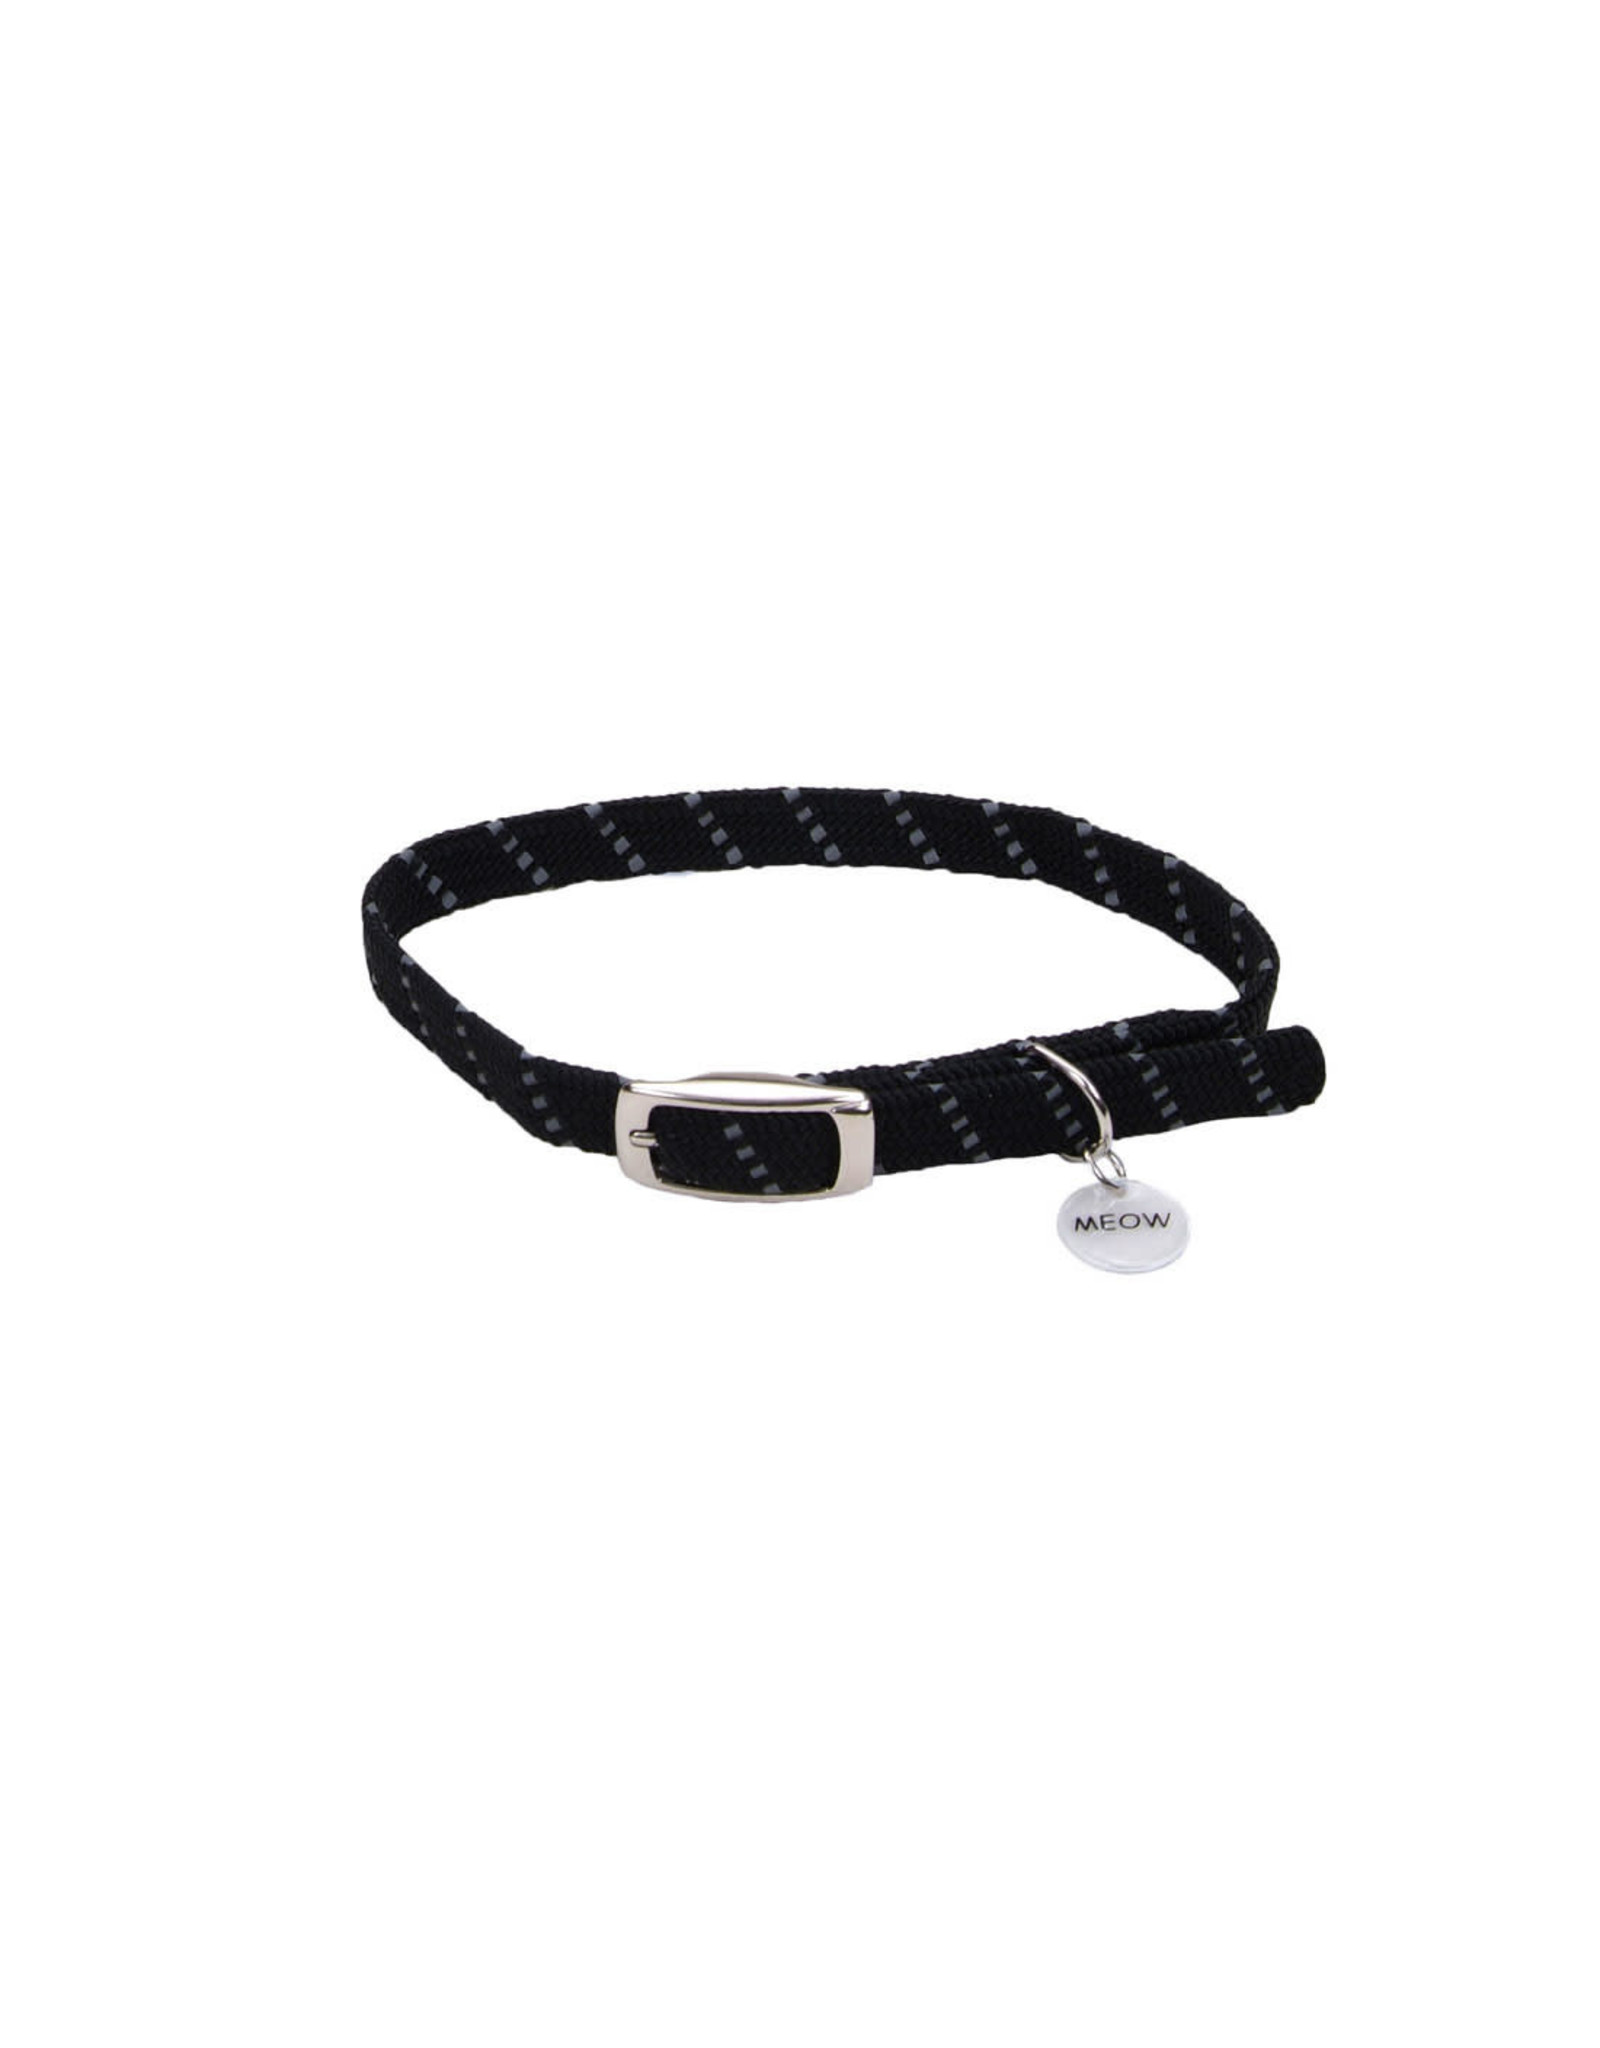 "Coastal Coastal Elasta Cat Reflective/Stretch Collar - 10 "" Black"